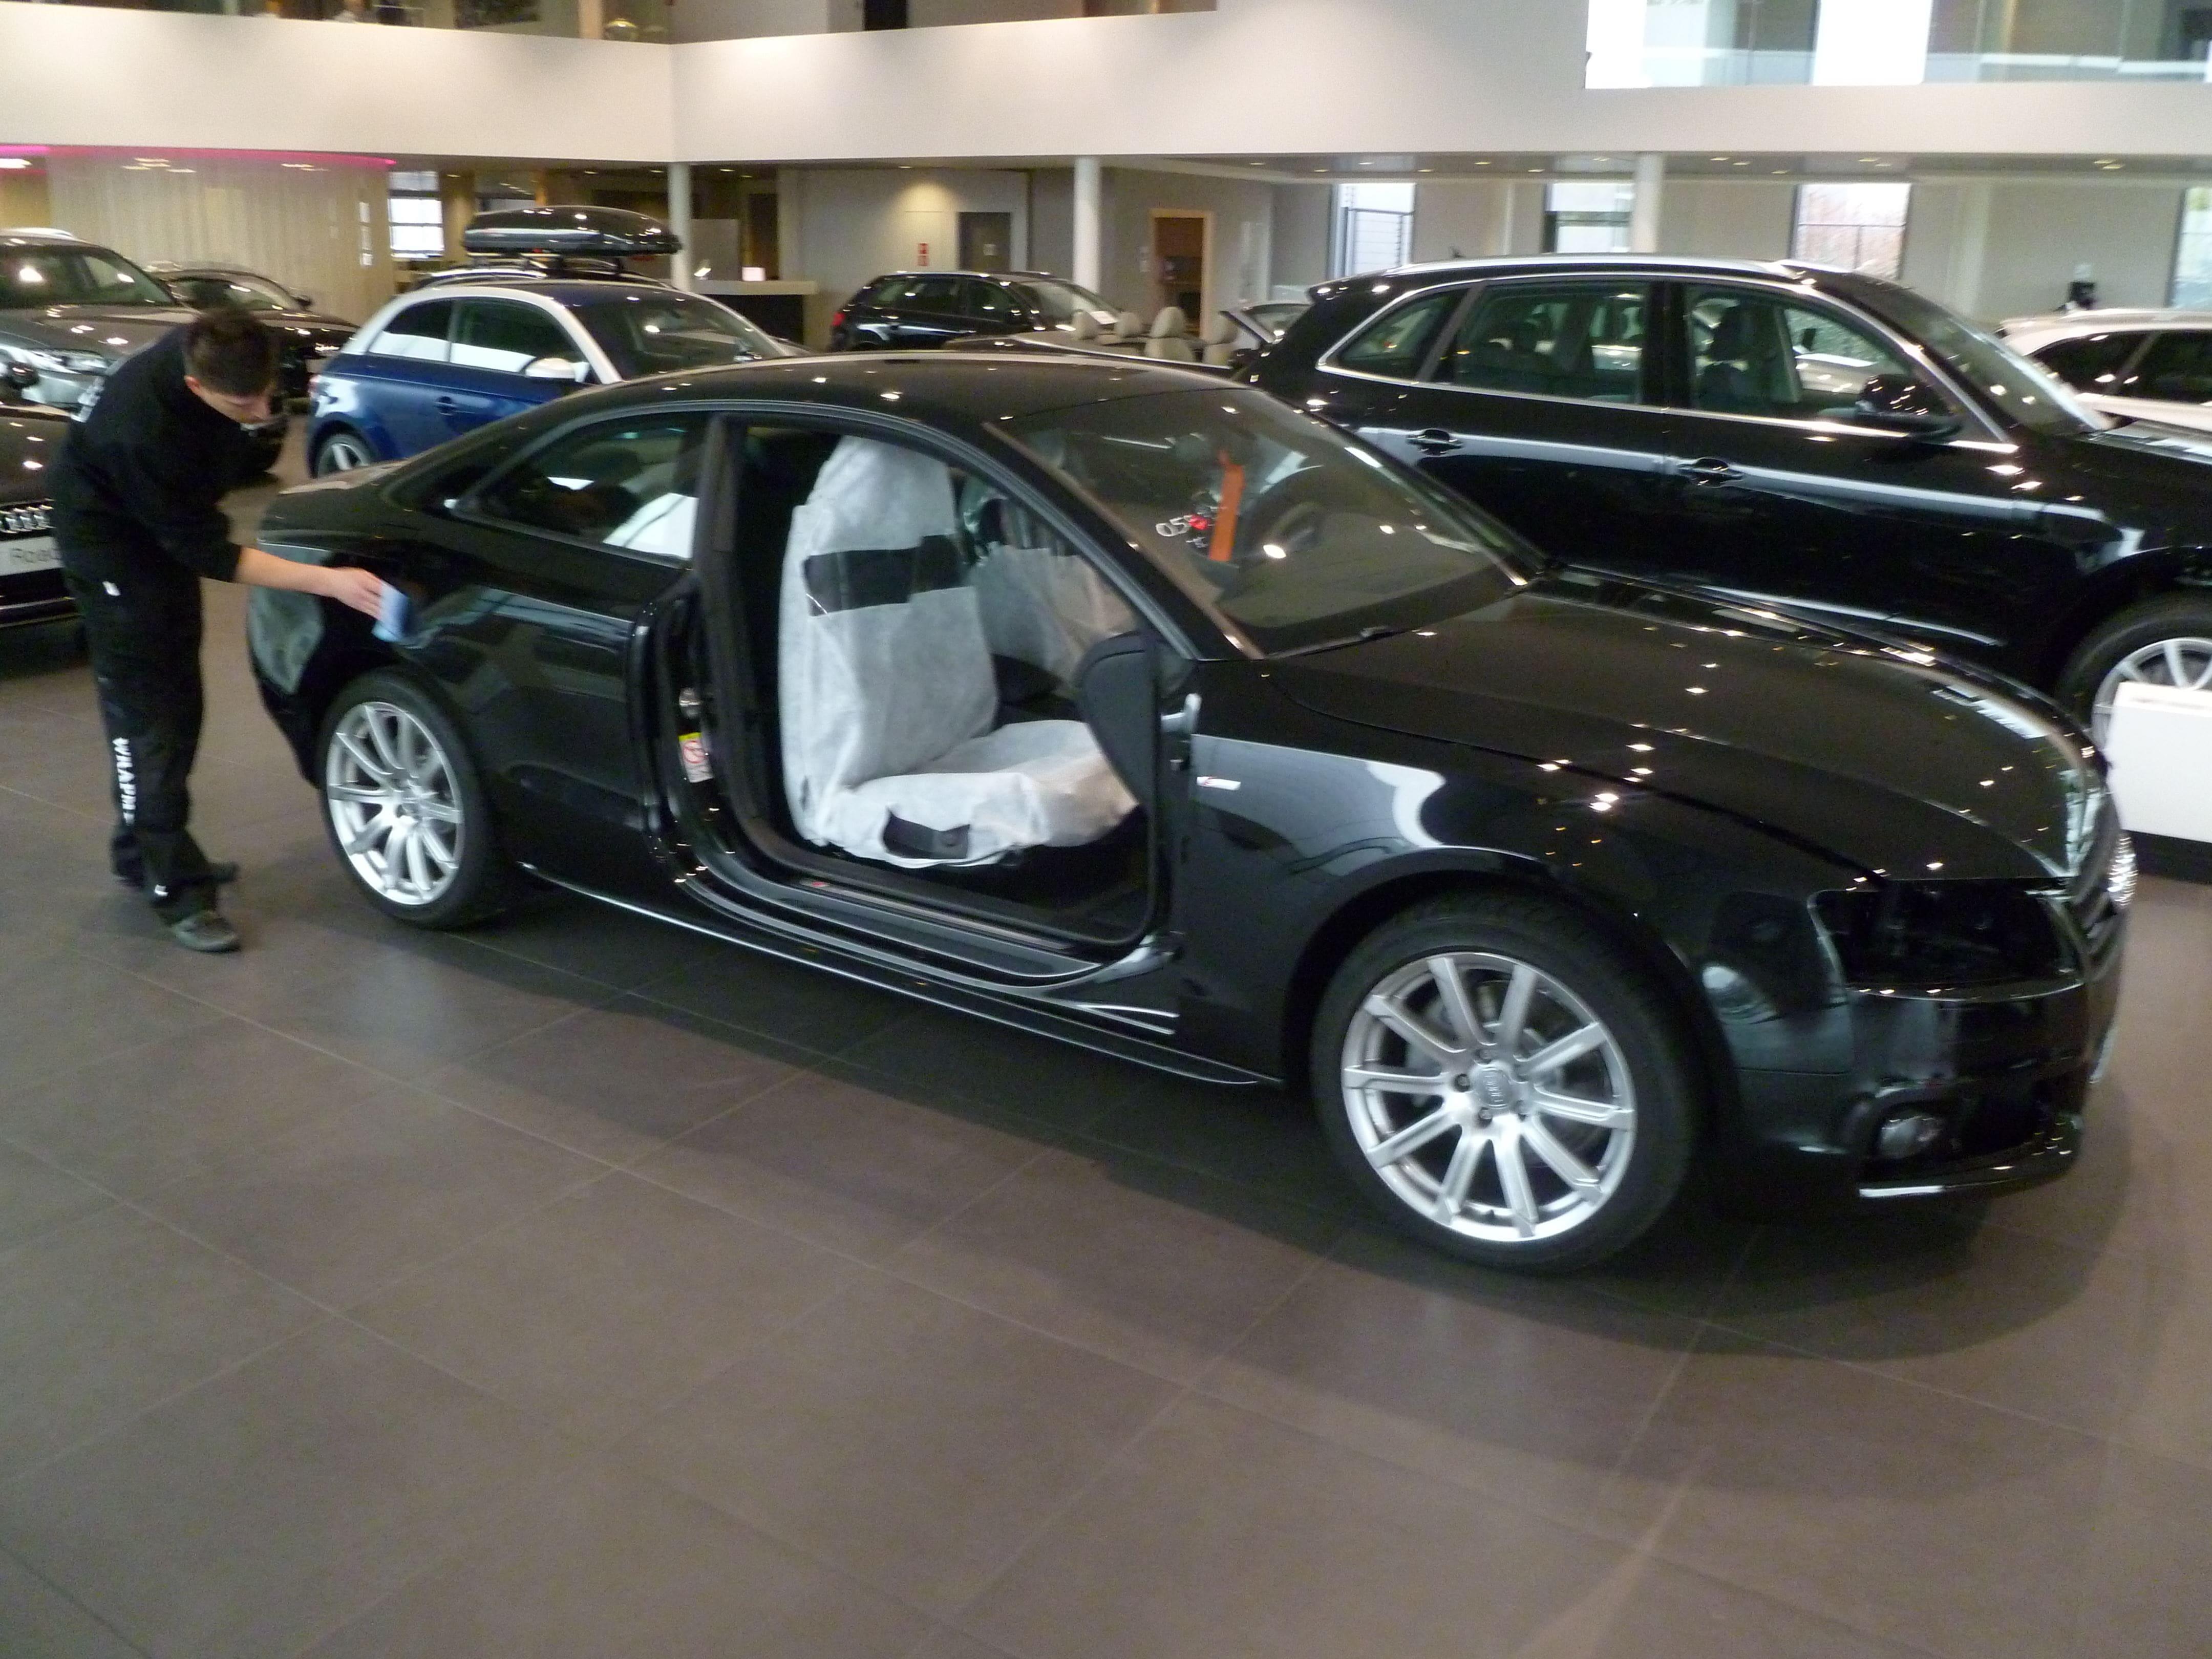 Audi A5 Coupe met Mat Zwarte Wrap, Carwrapping door Wrapmyride.nu Foto-nr:4609, ©2021